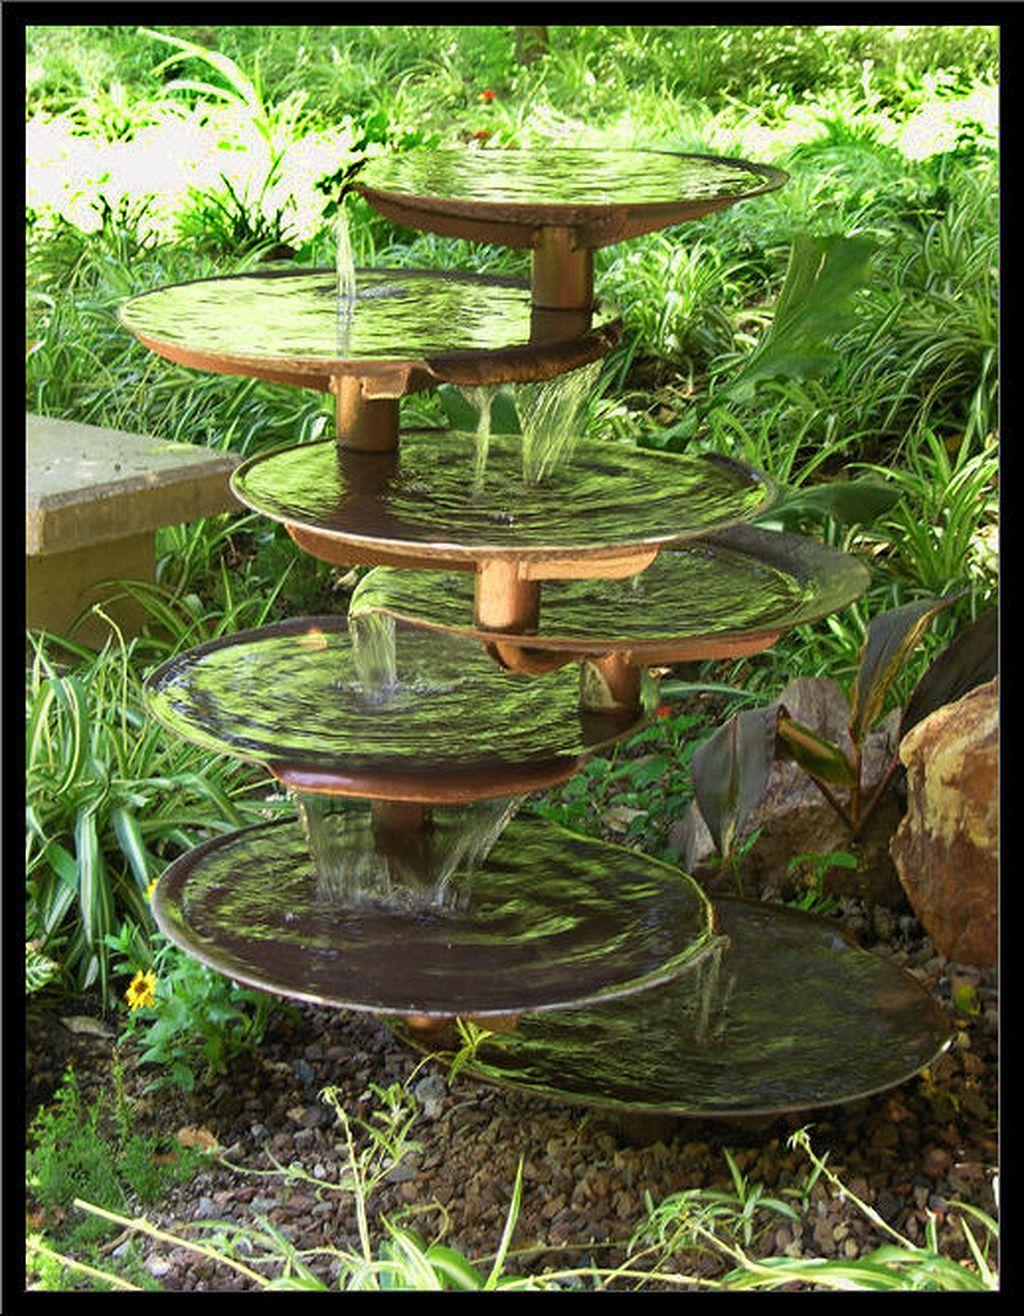 30 Creative Pond And Fountain Ideas Garden Fountains Water Features In The Garden Fountains Outdoor